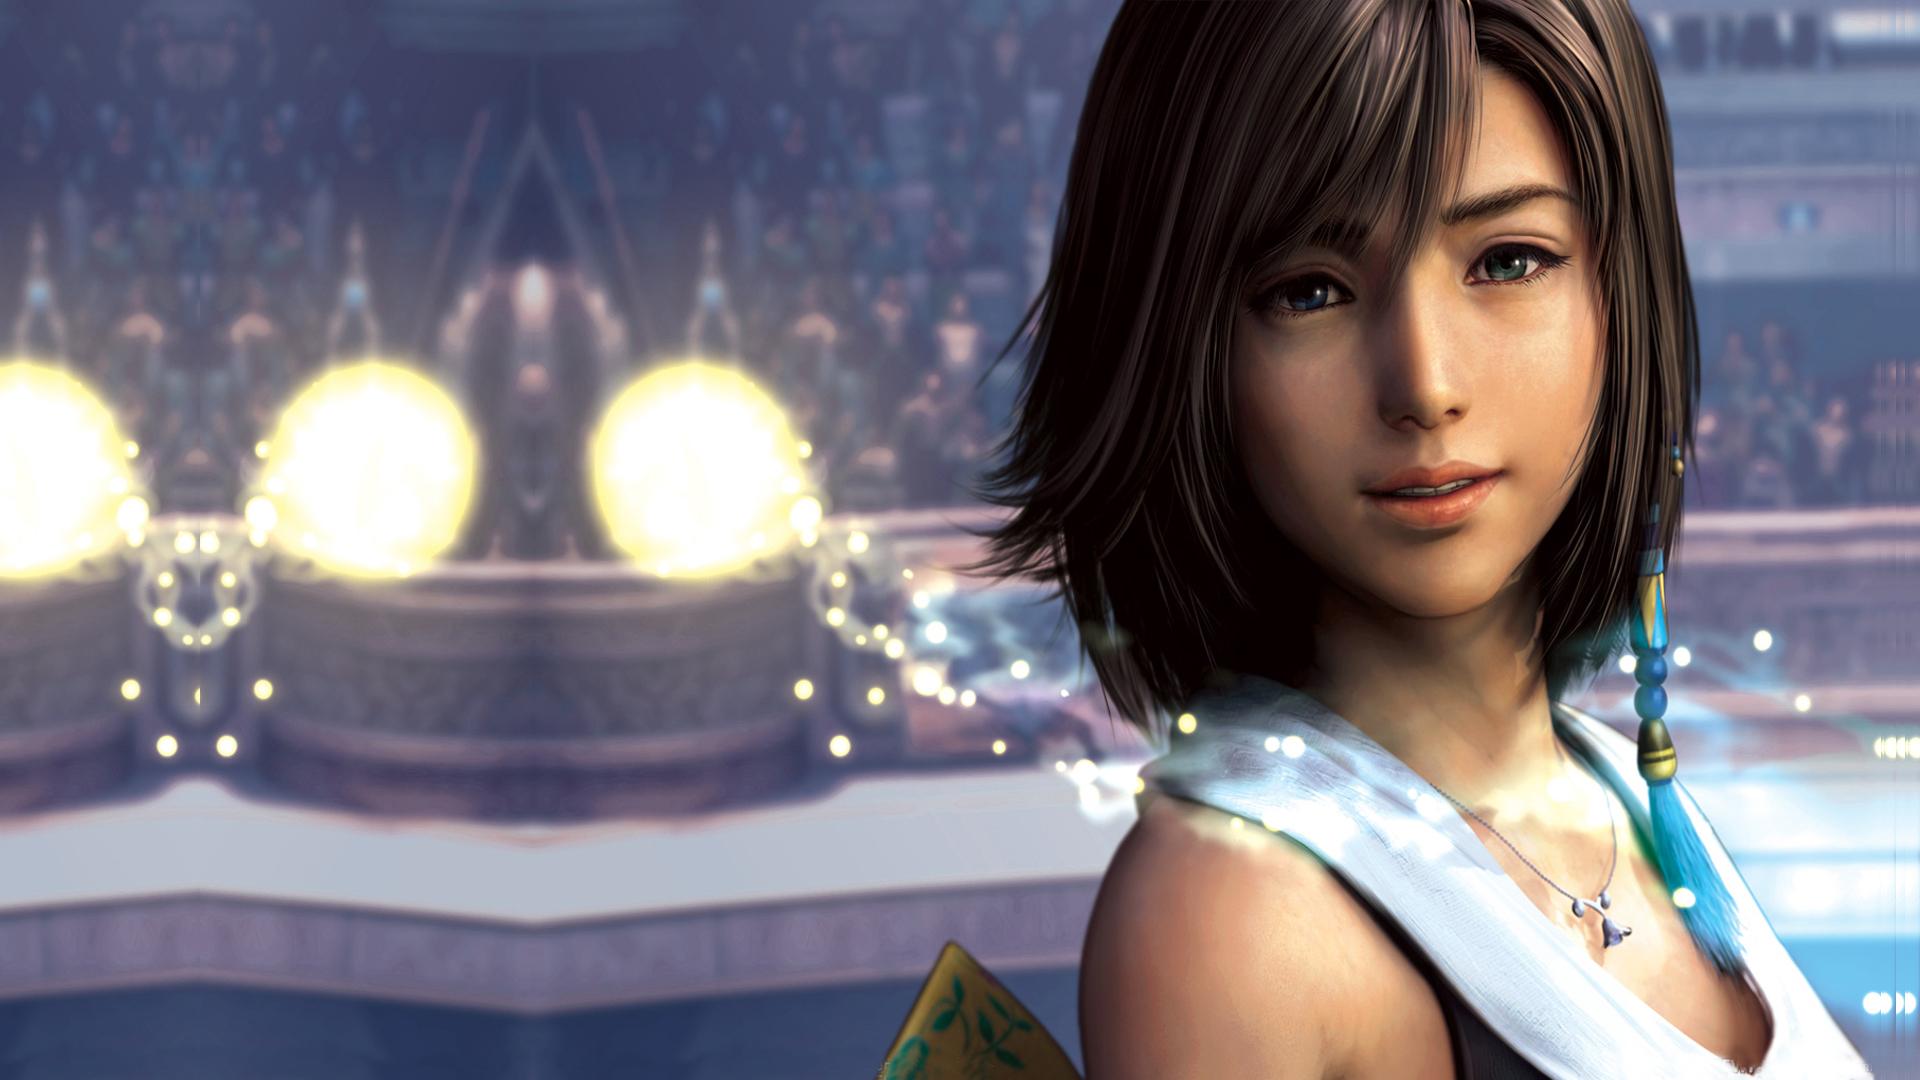 Final Fantasy Wallpaper Background